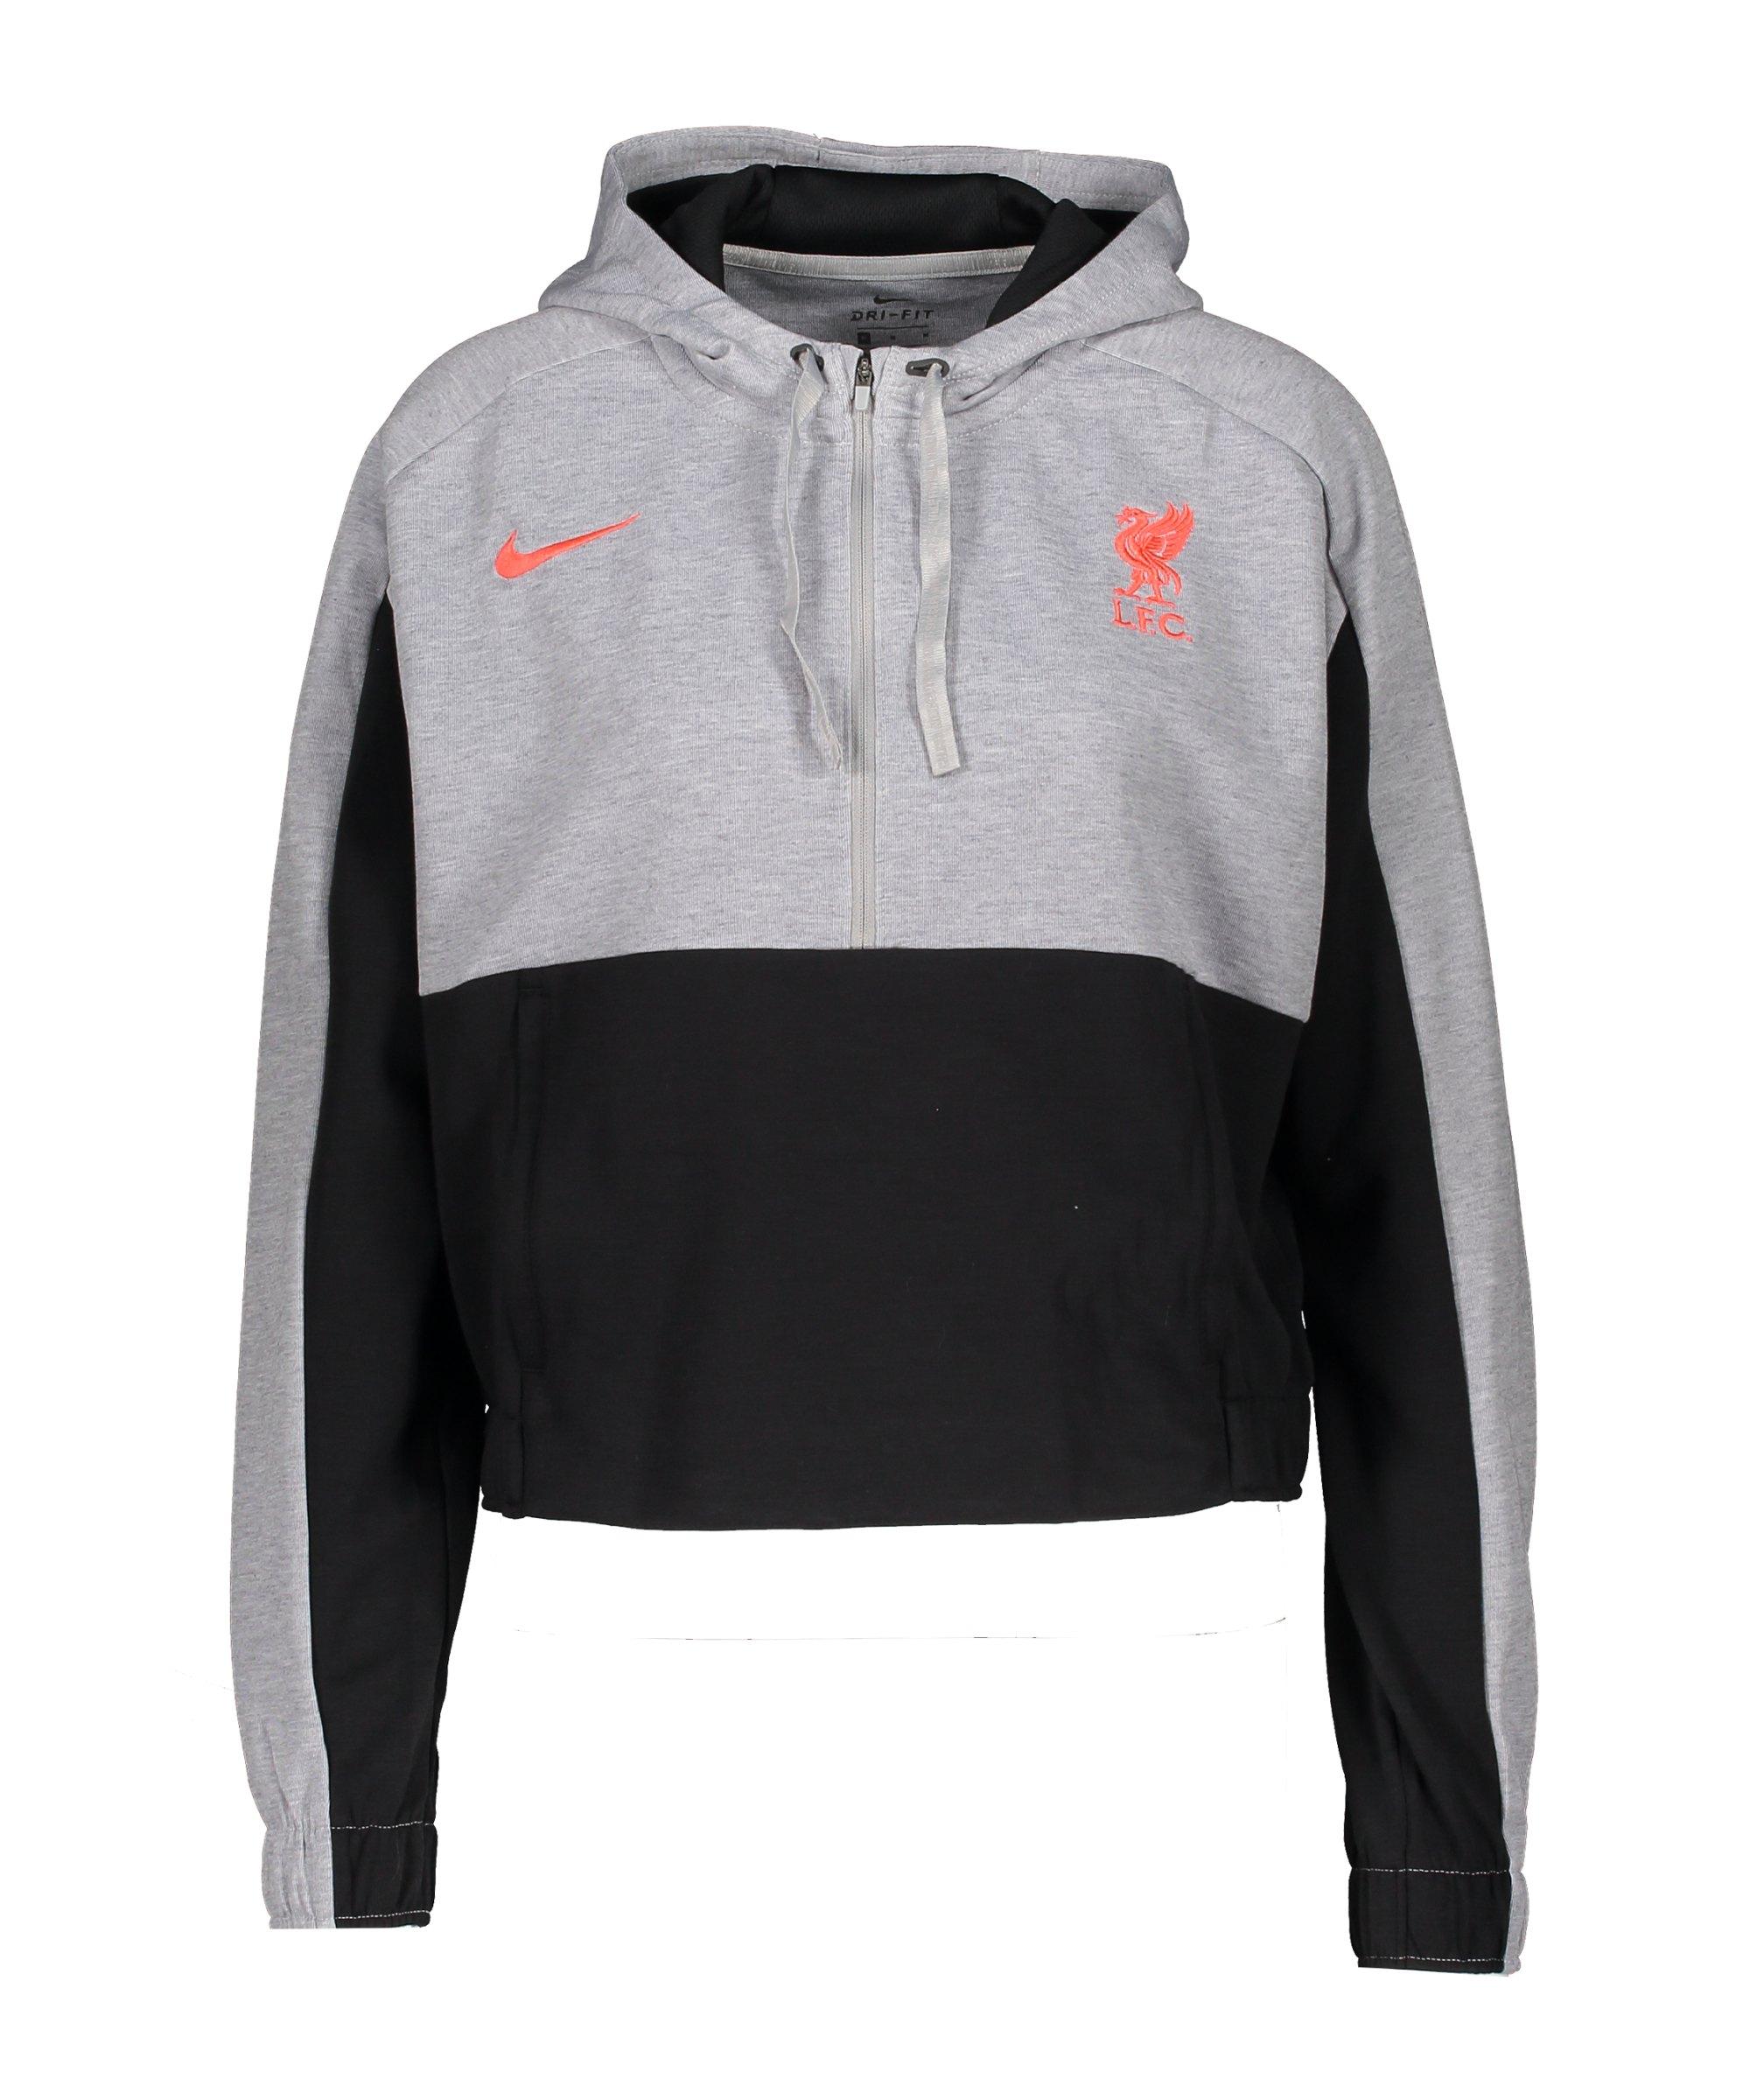 Nike FC Liverpool Cropped HalfZip Hoody Damen Grau F064 - grau